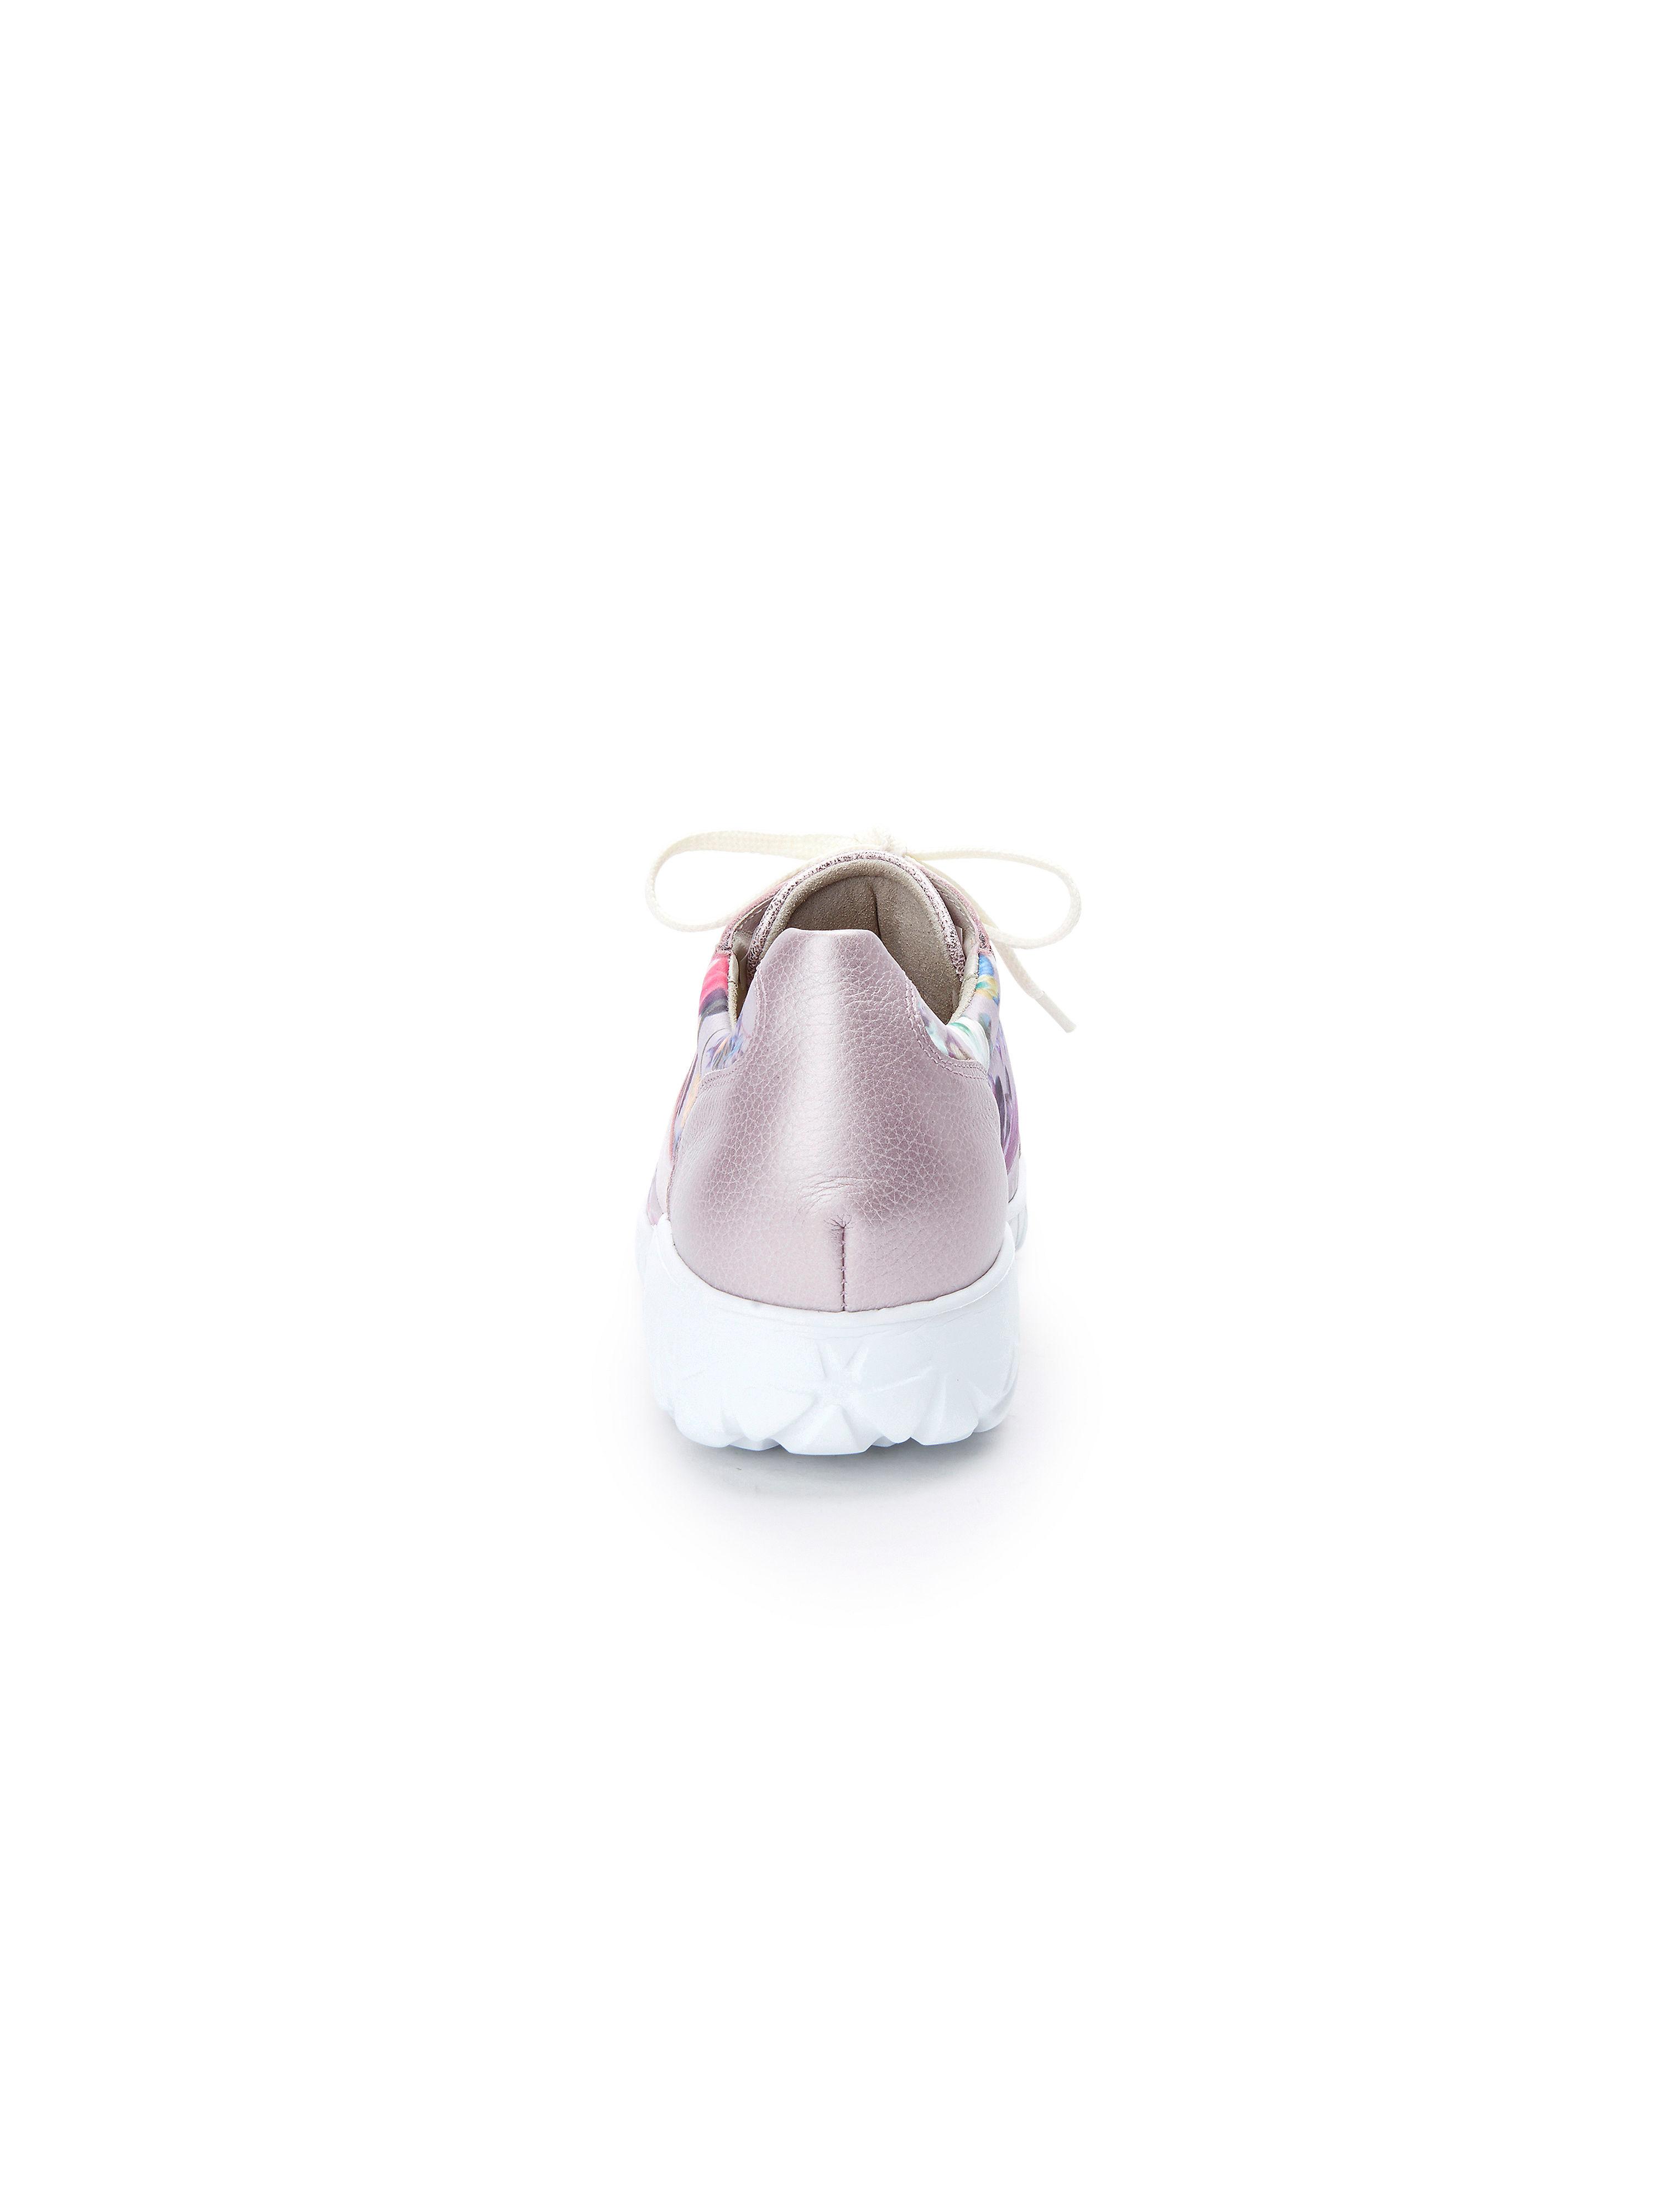 Waldläufer - Sneaker Havy-Soft - Schuhe Mauve/Multicolor Gute Qualität beliebte Schuhe - 1bbd17